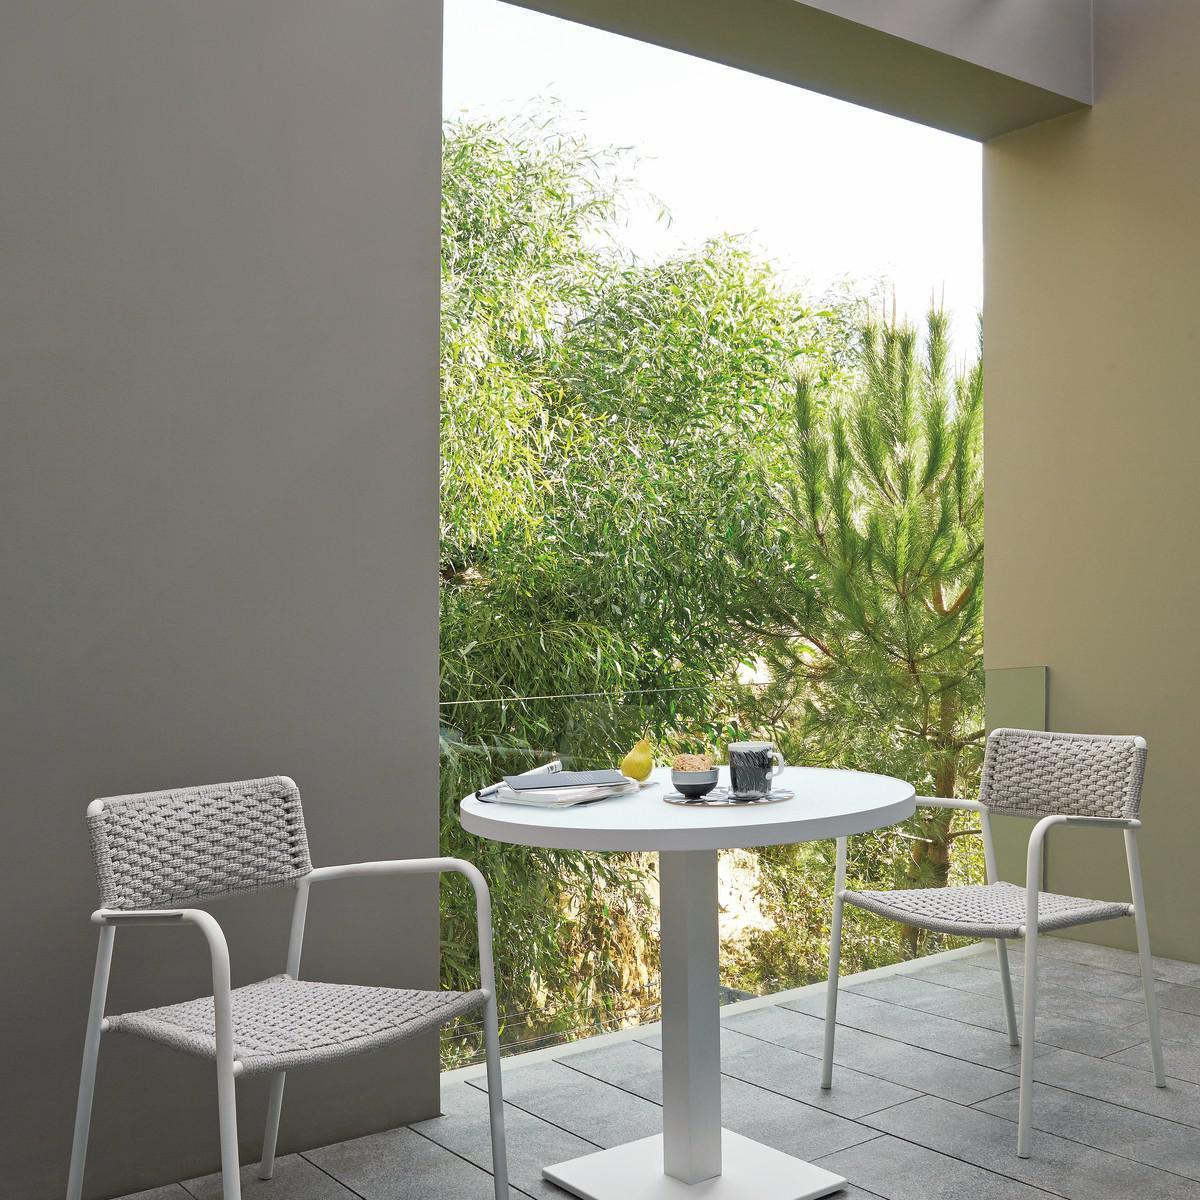 Echo Lounge Chairs